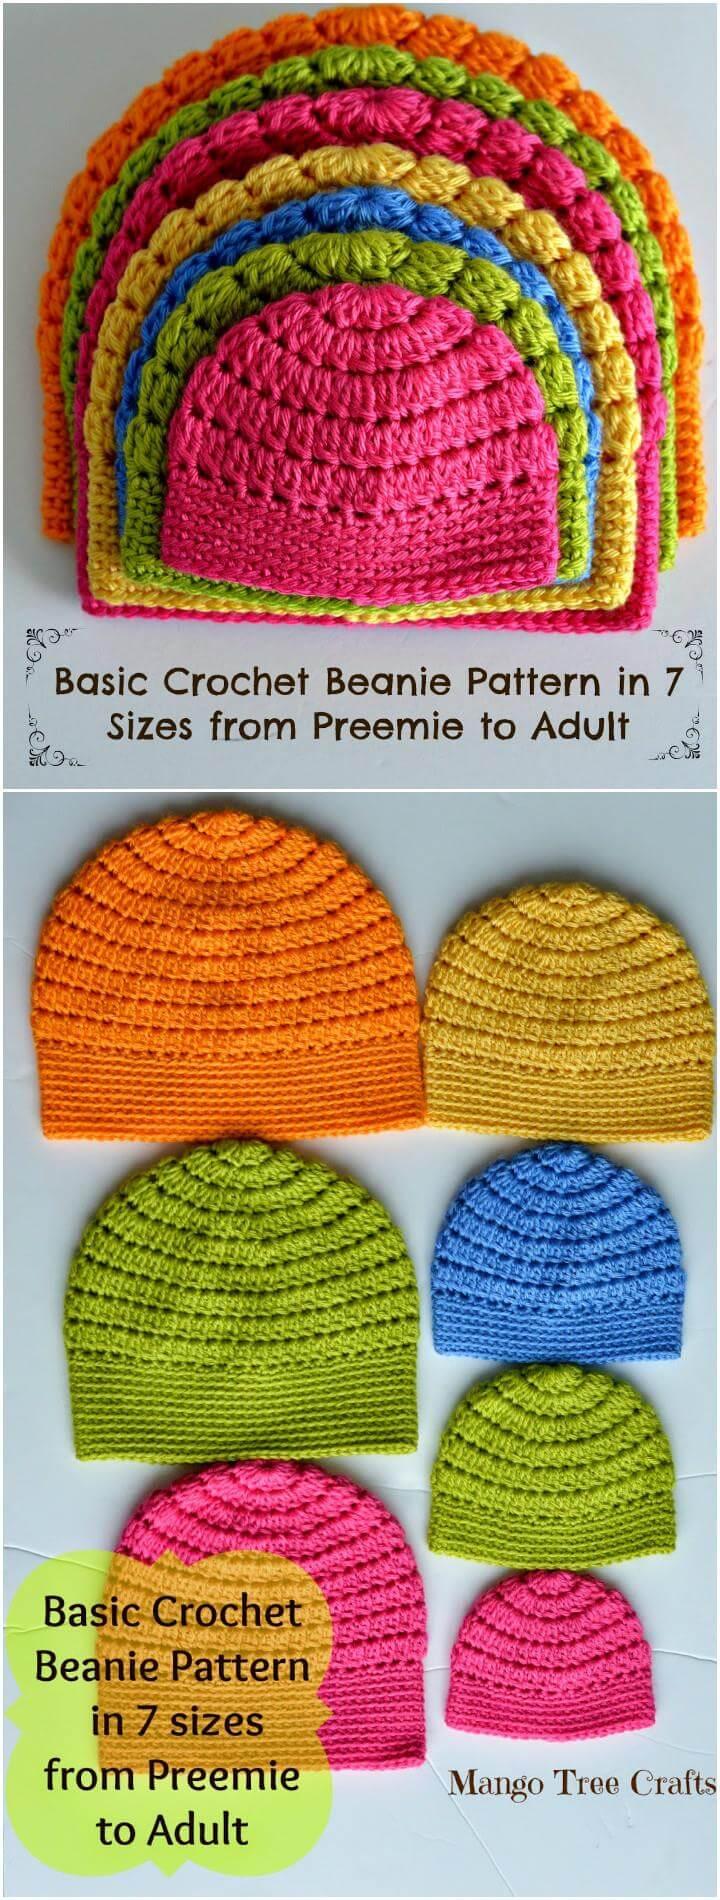 mango tree crafts crochet hat sizes